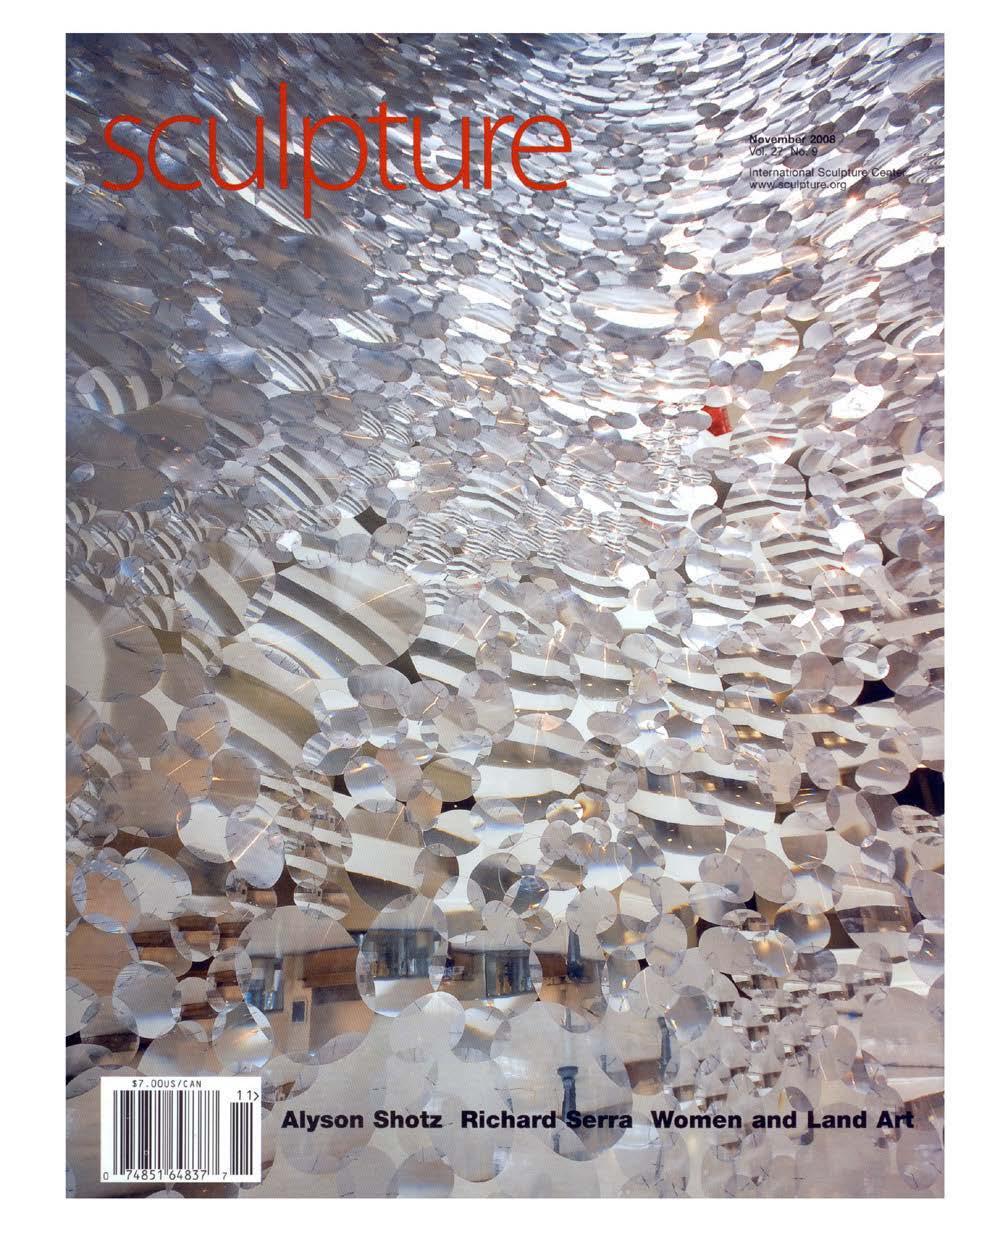 Sculpture Magazine: November, 2008